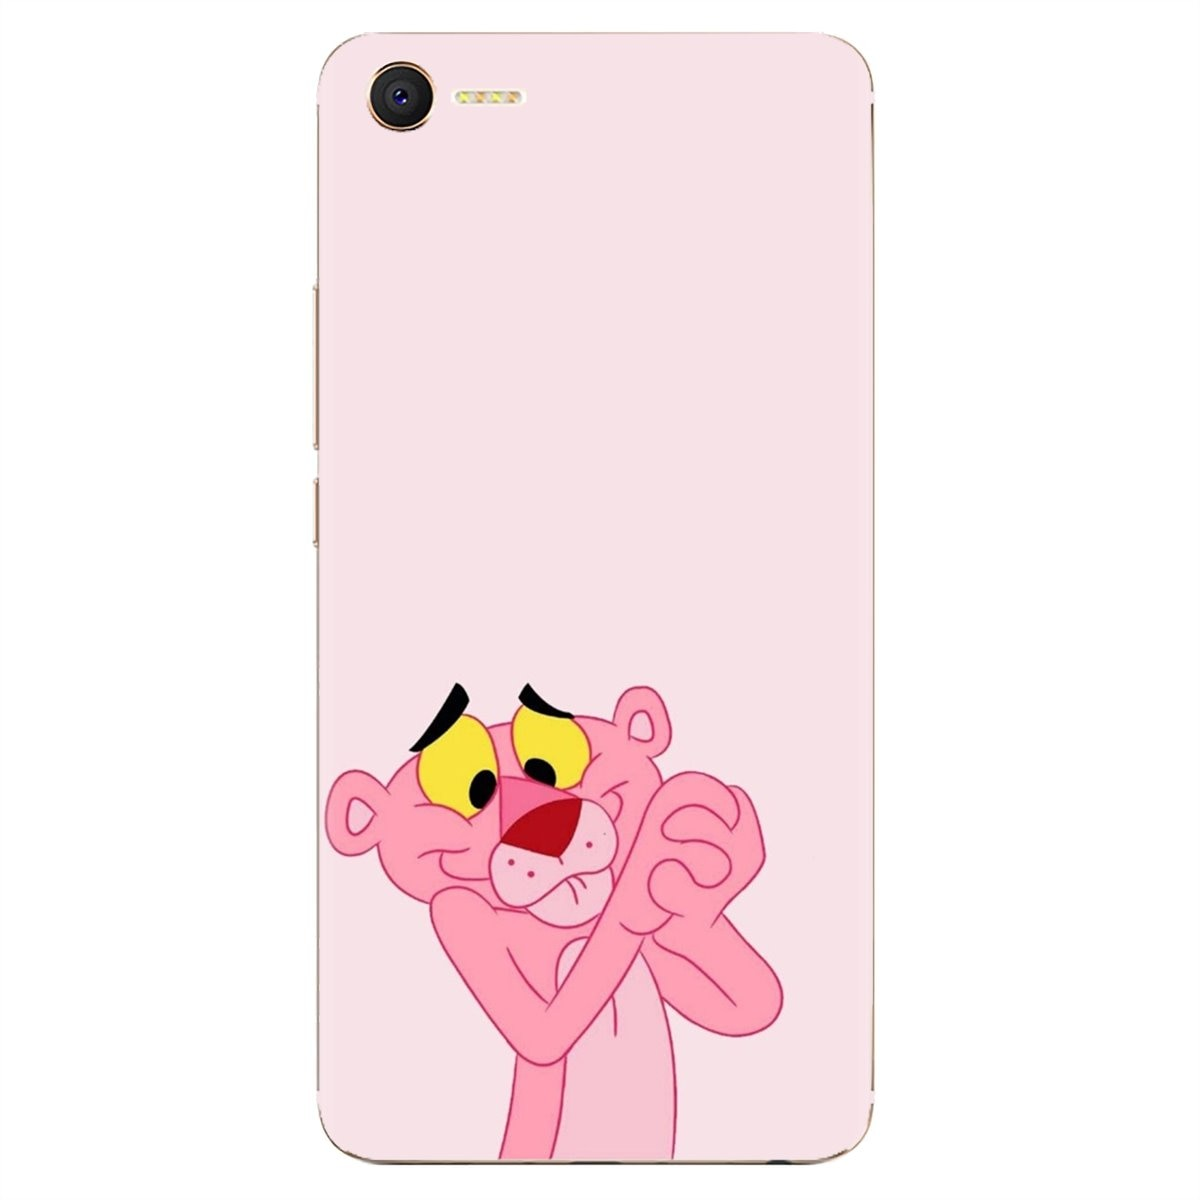 Funda de teléfono de silicona personalizada, papel tapiz de pantera rosa para Xiaomi Redmi 4A 7A S2 Note 8 3 3S 4 4X 5 Plus 6 7 6A Pro Pocophone F1